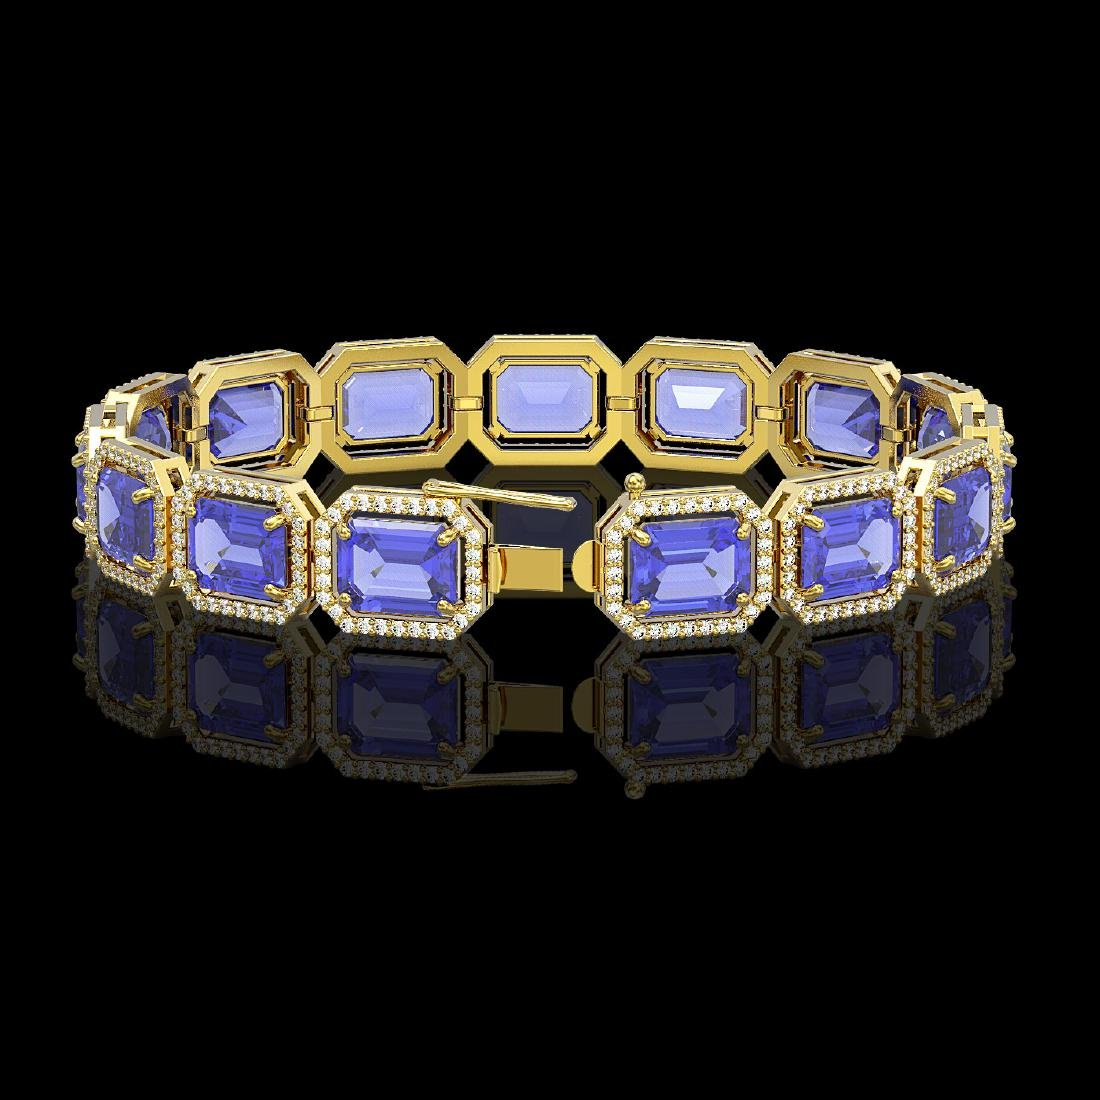 36.37 CTW Tanzanite & Diamond Halo Bracelet 10K Yellow - 2